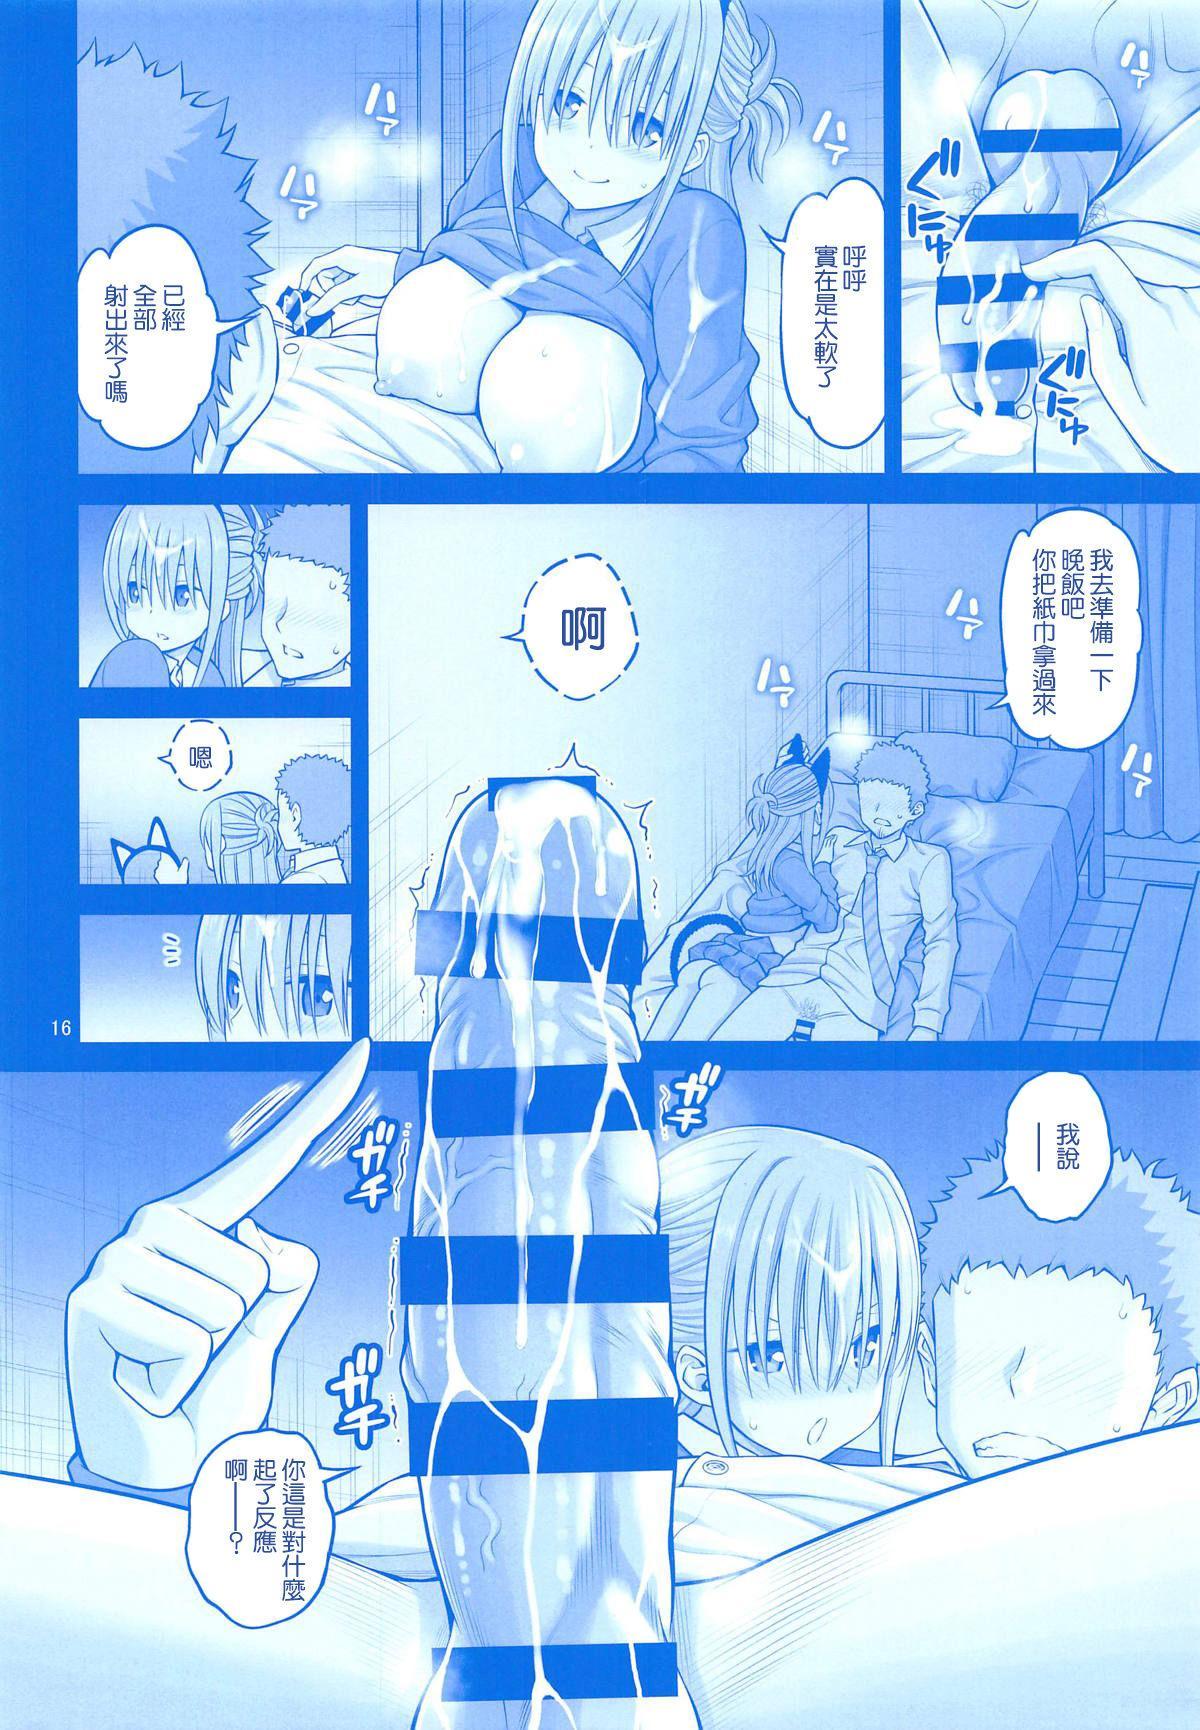 Otonari no Tawawa 14